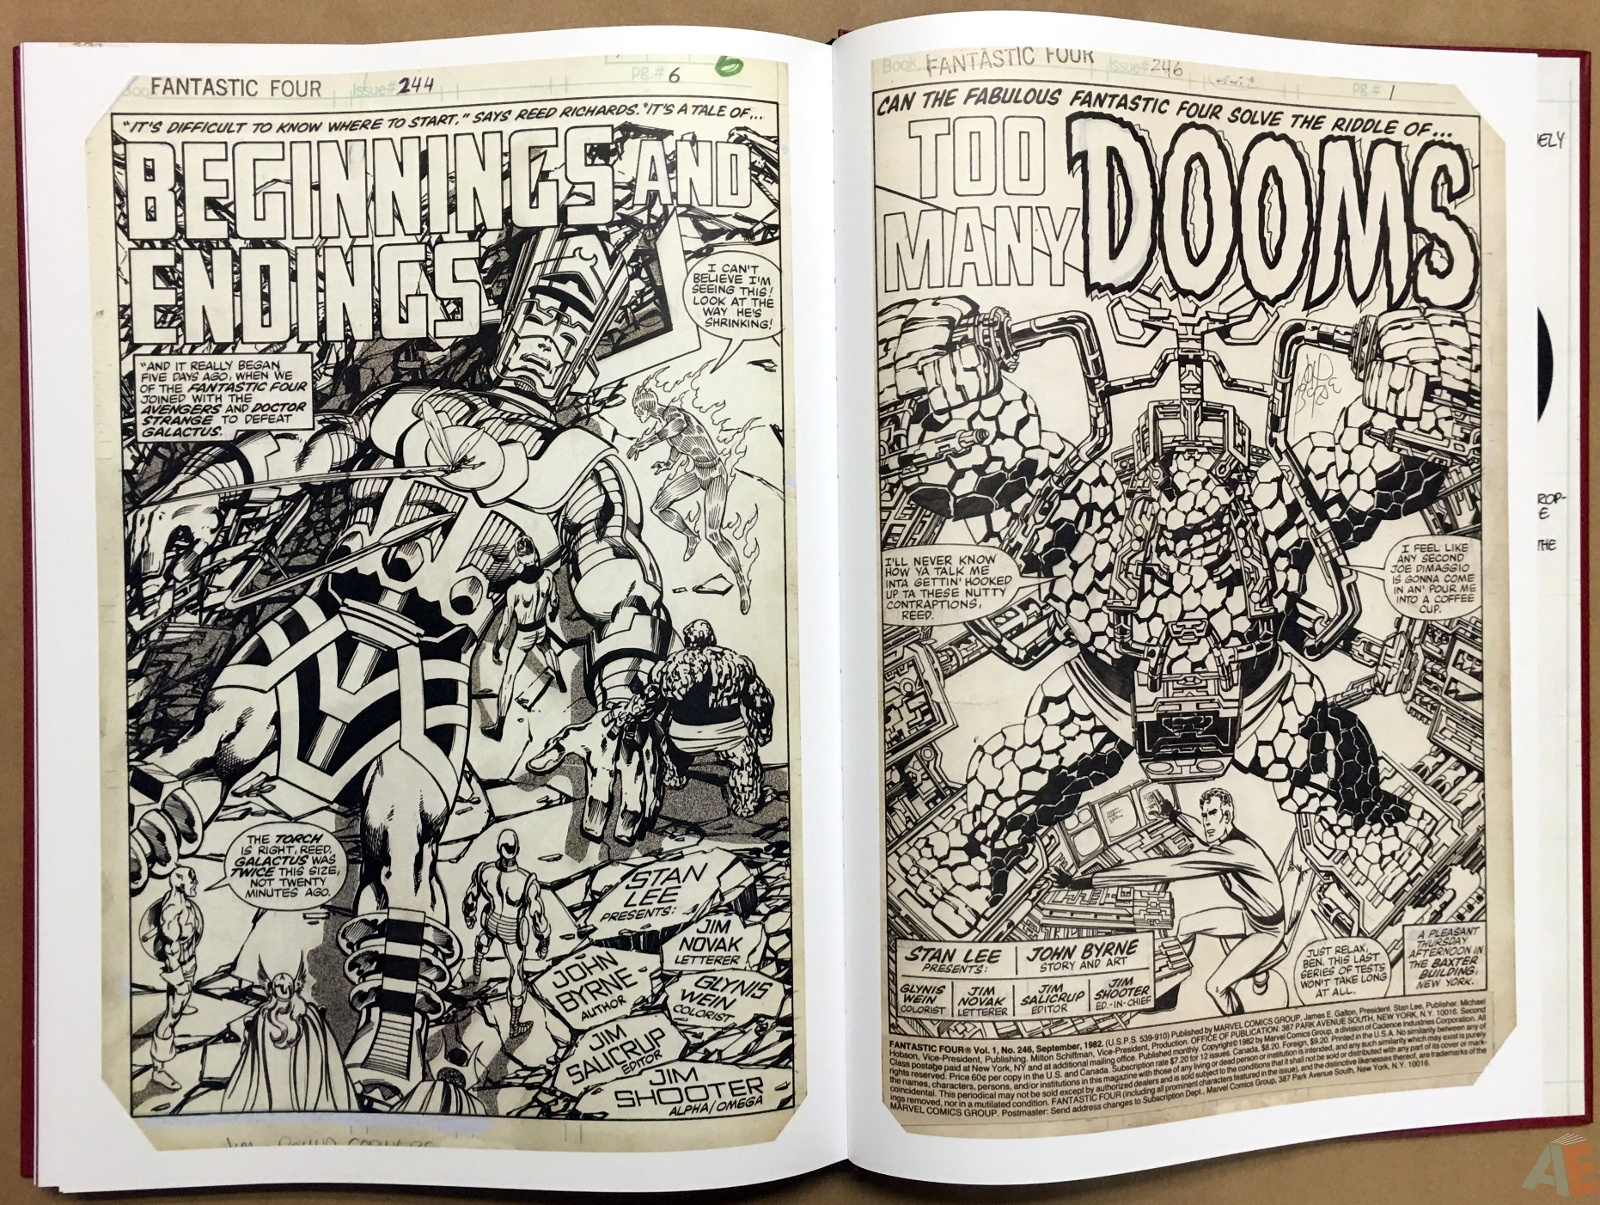 John Byrne's The Fantastic Four Artist's Edition 60